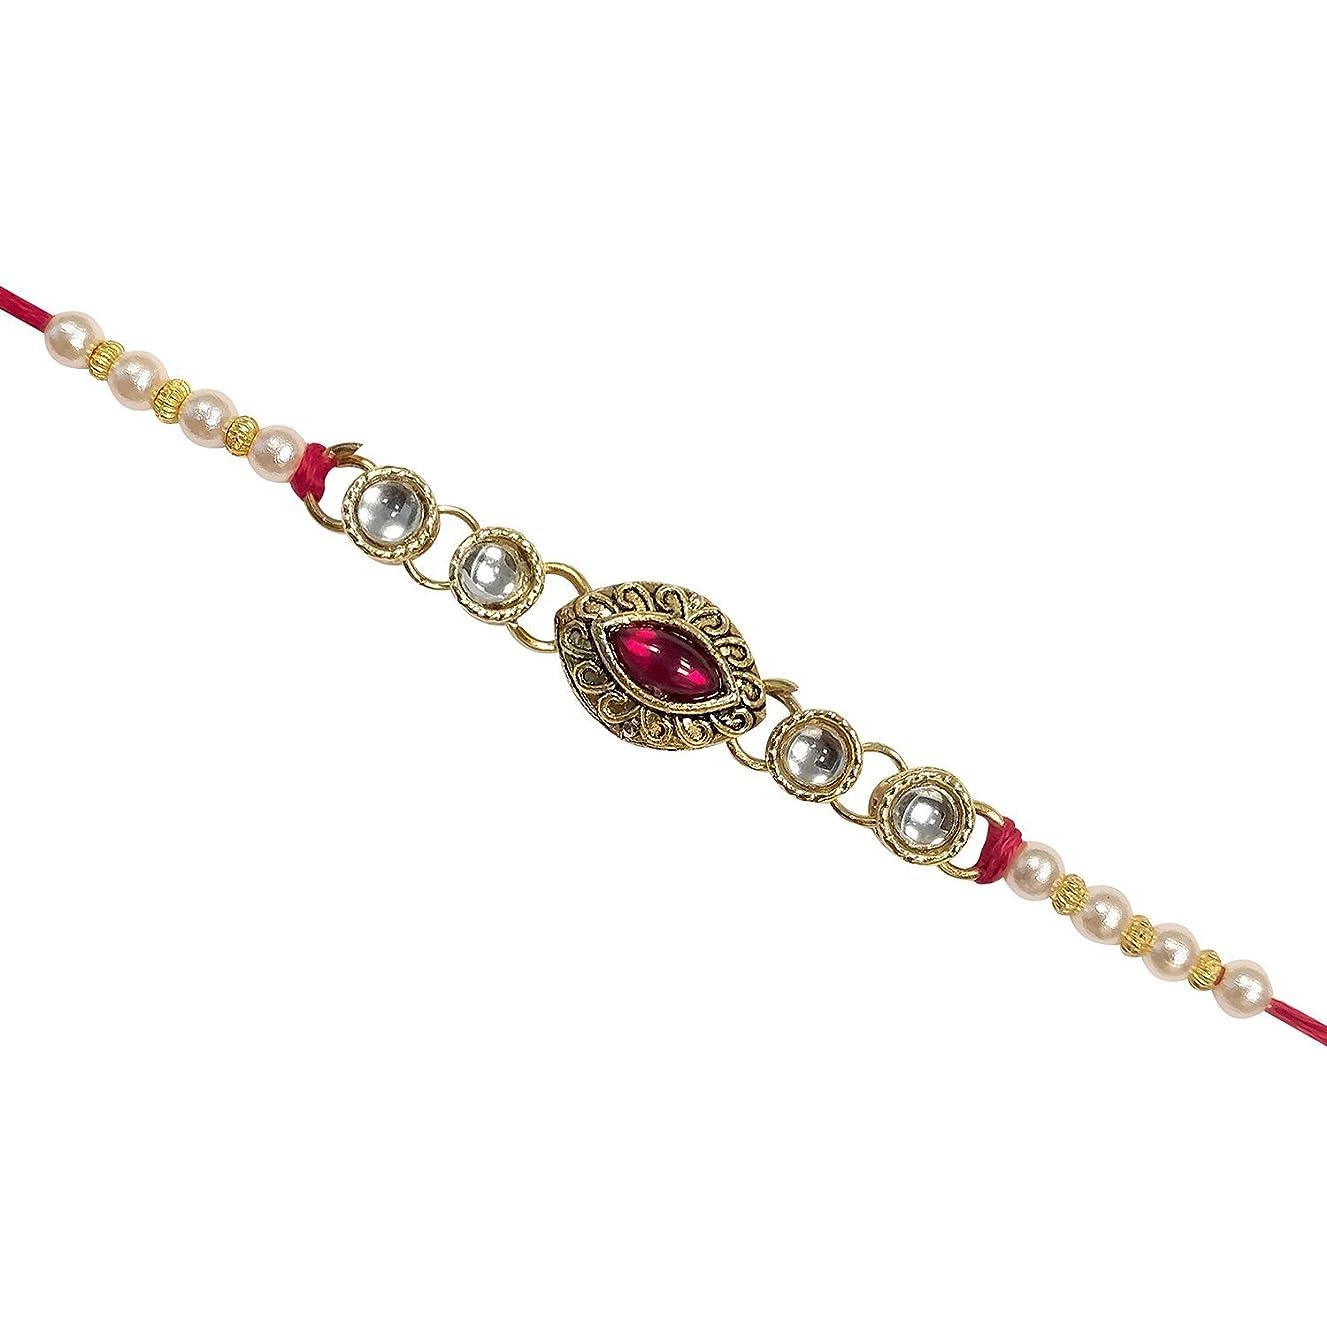 Traditional Handmade Rakhi Thread for Brother Bhaiya Oval Shape Kundan Decorated Rakhi for Rakshabandhan